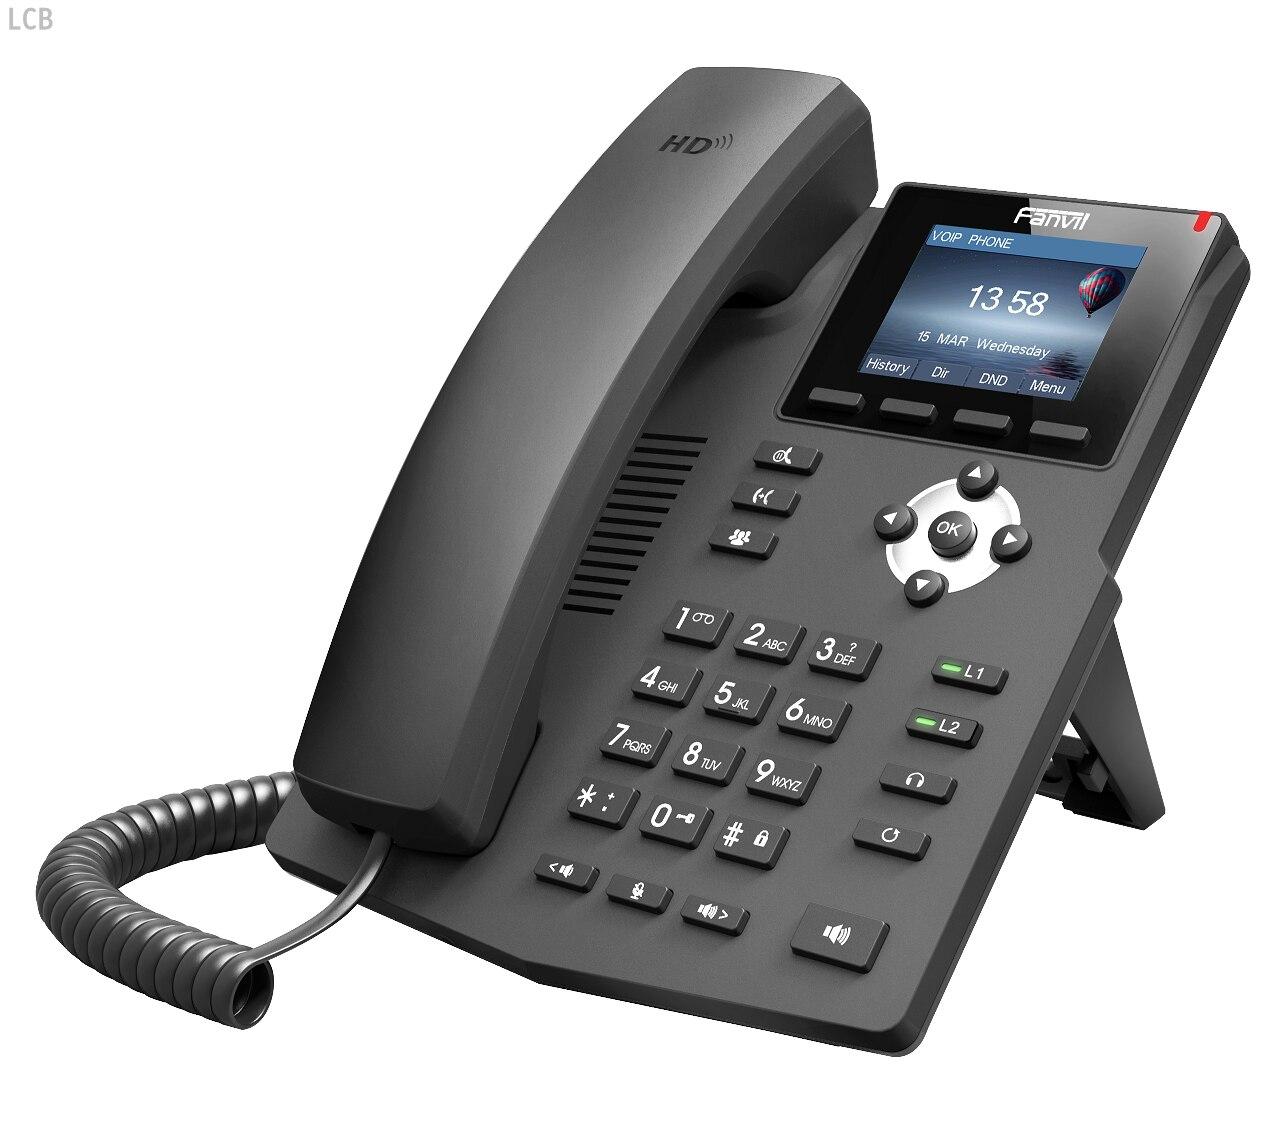 Fanvil X3s Ip Telefon Sohoip Telefon Industrie Telefon 2 Sip Linien Hd Stimme Poe Aktiviert Kopfhörer Smart Deskphone